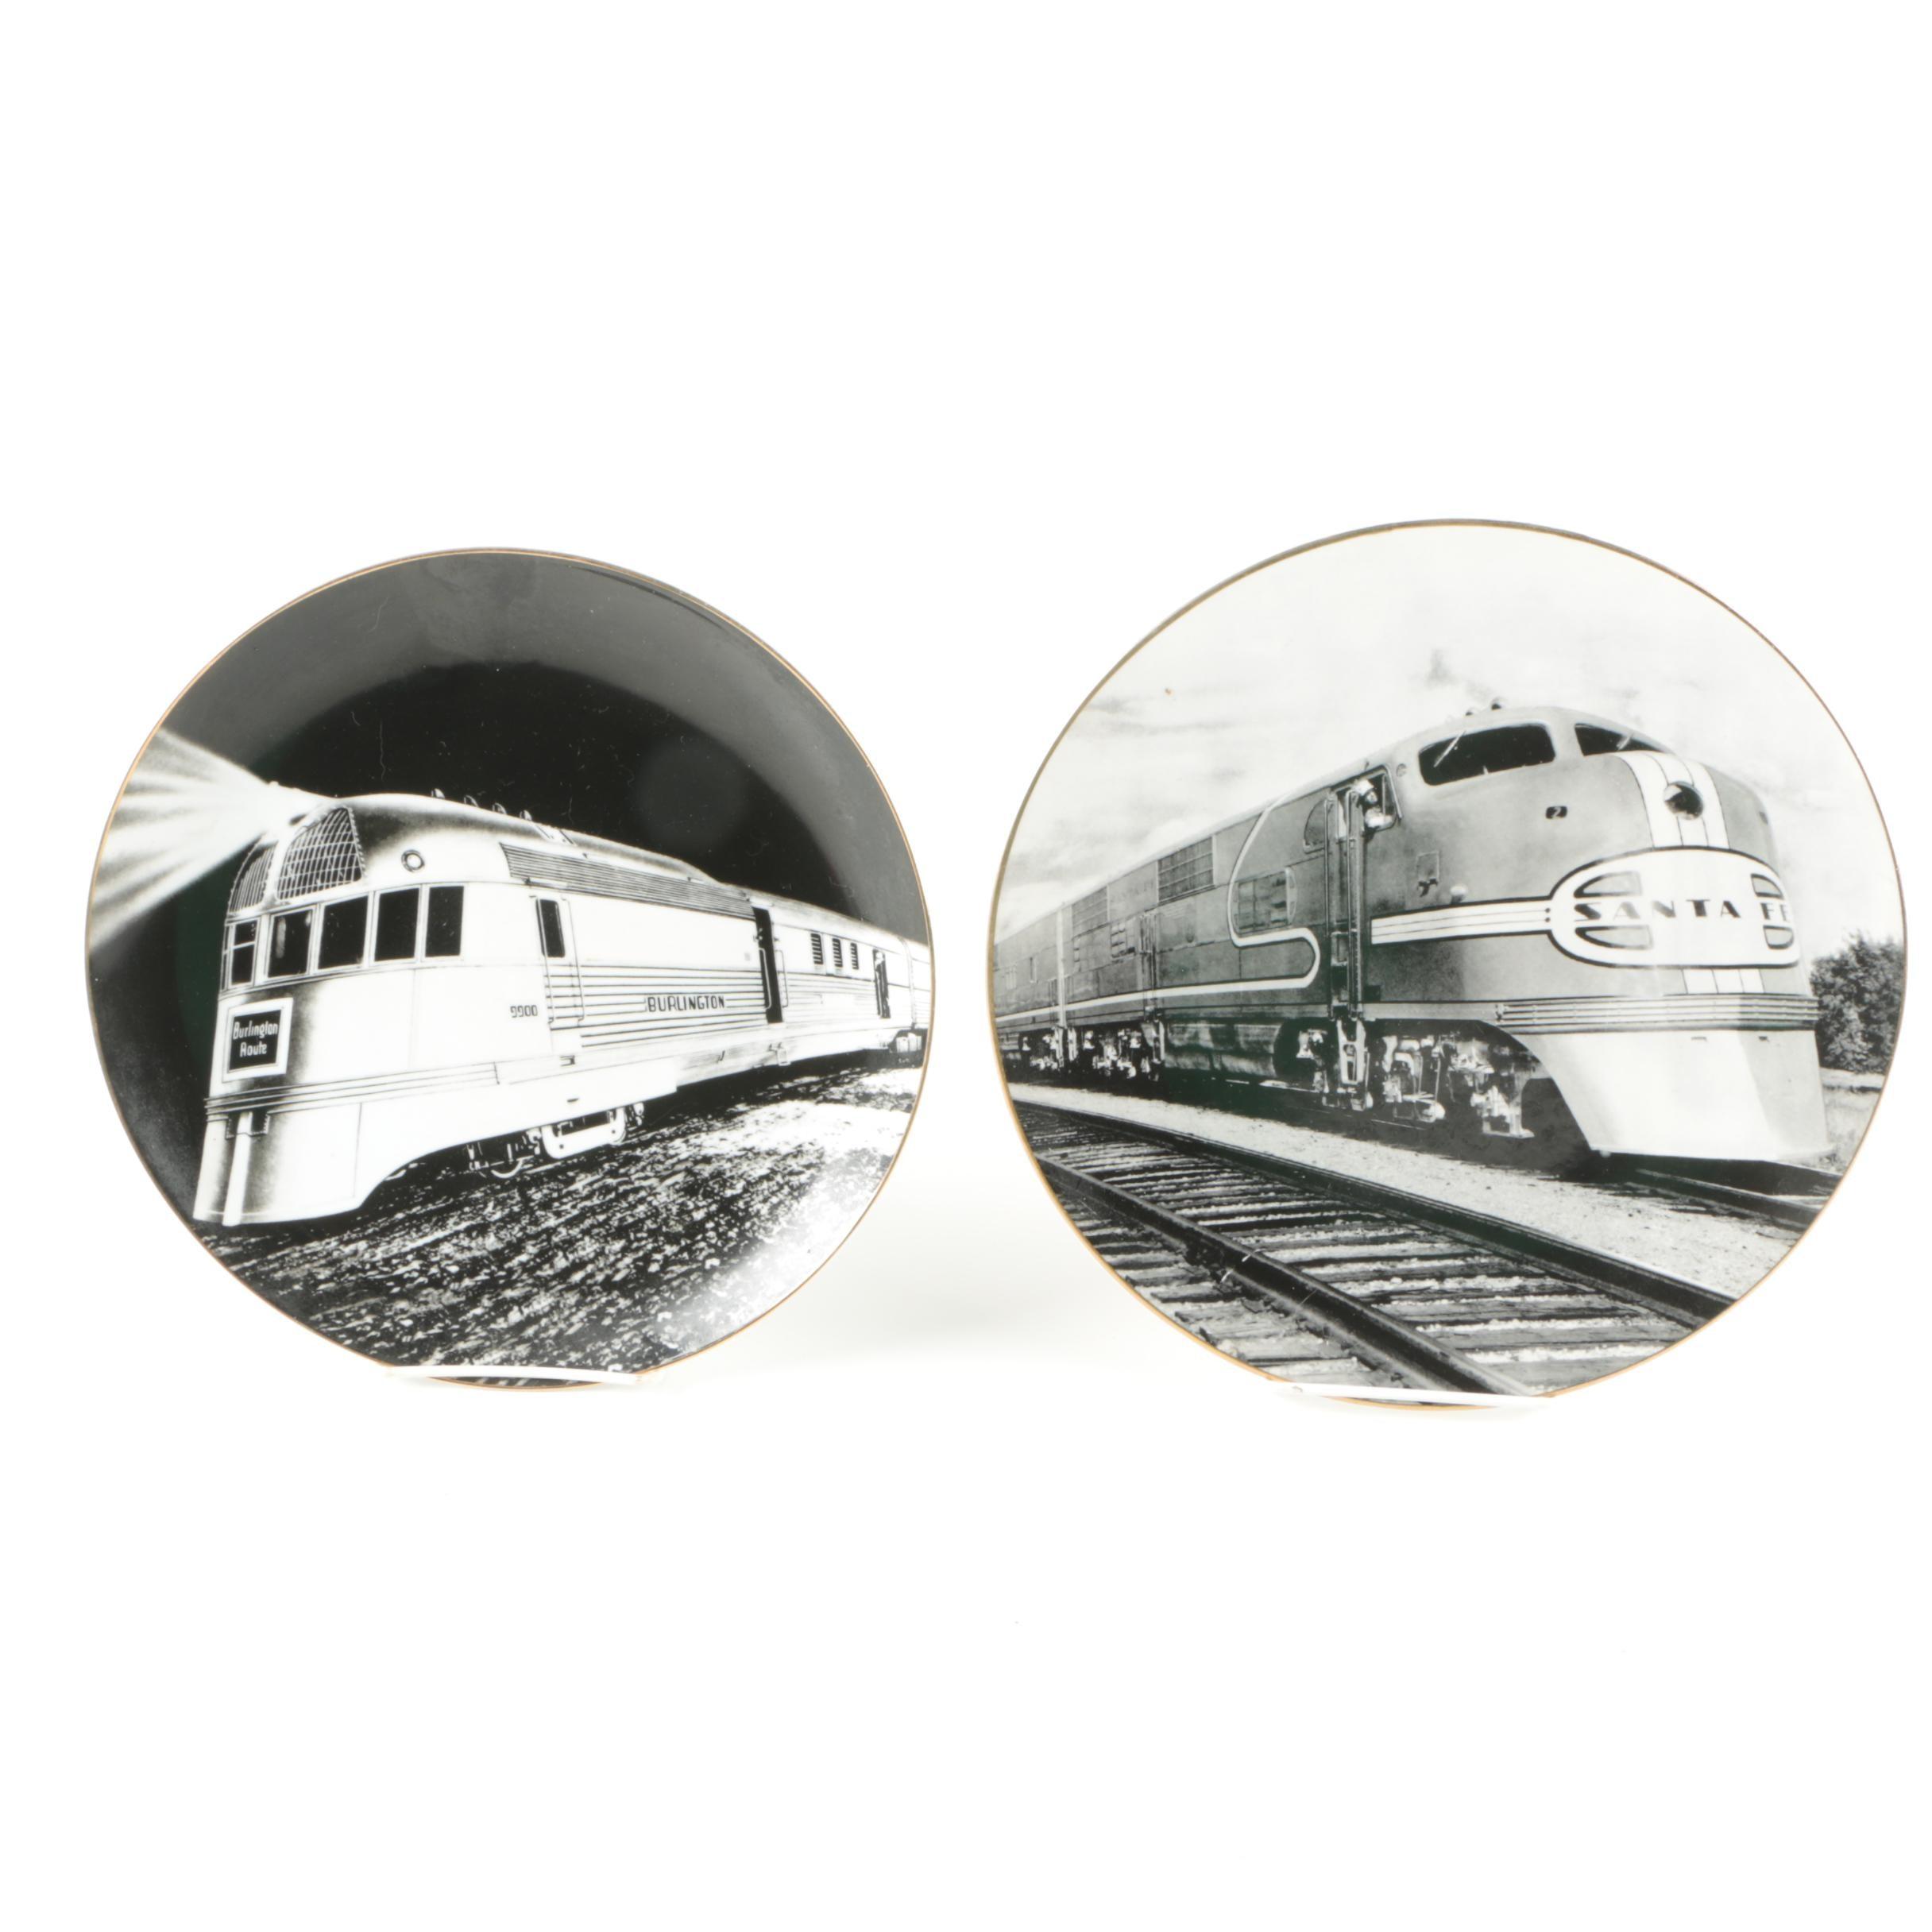 BNSF Railway Porcelain Collector's Plates